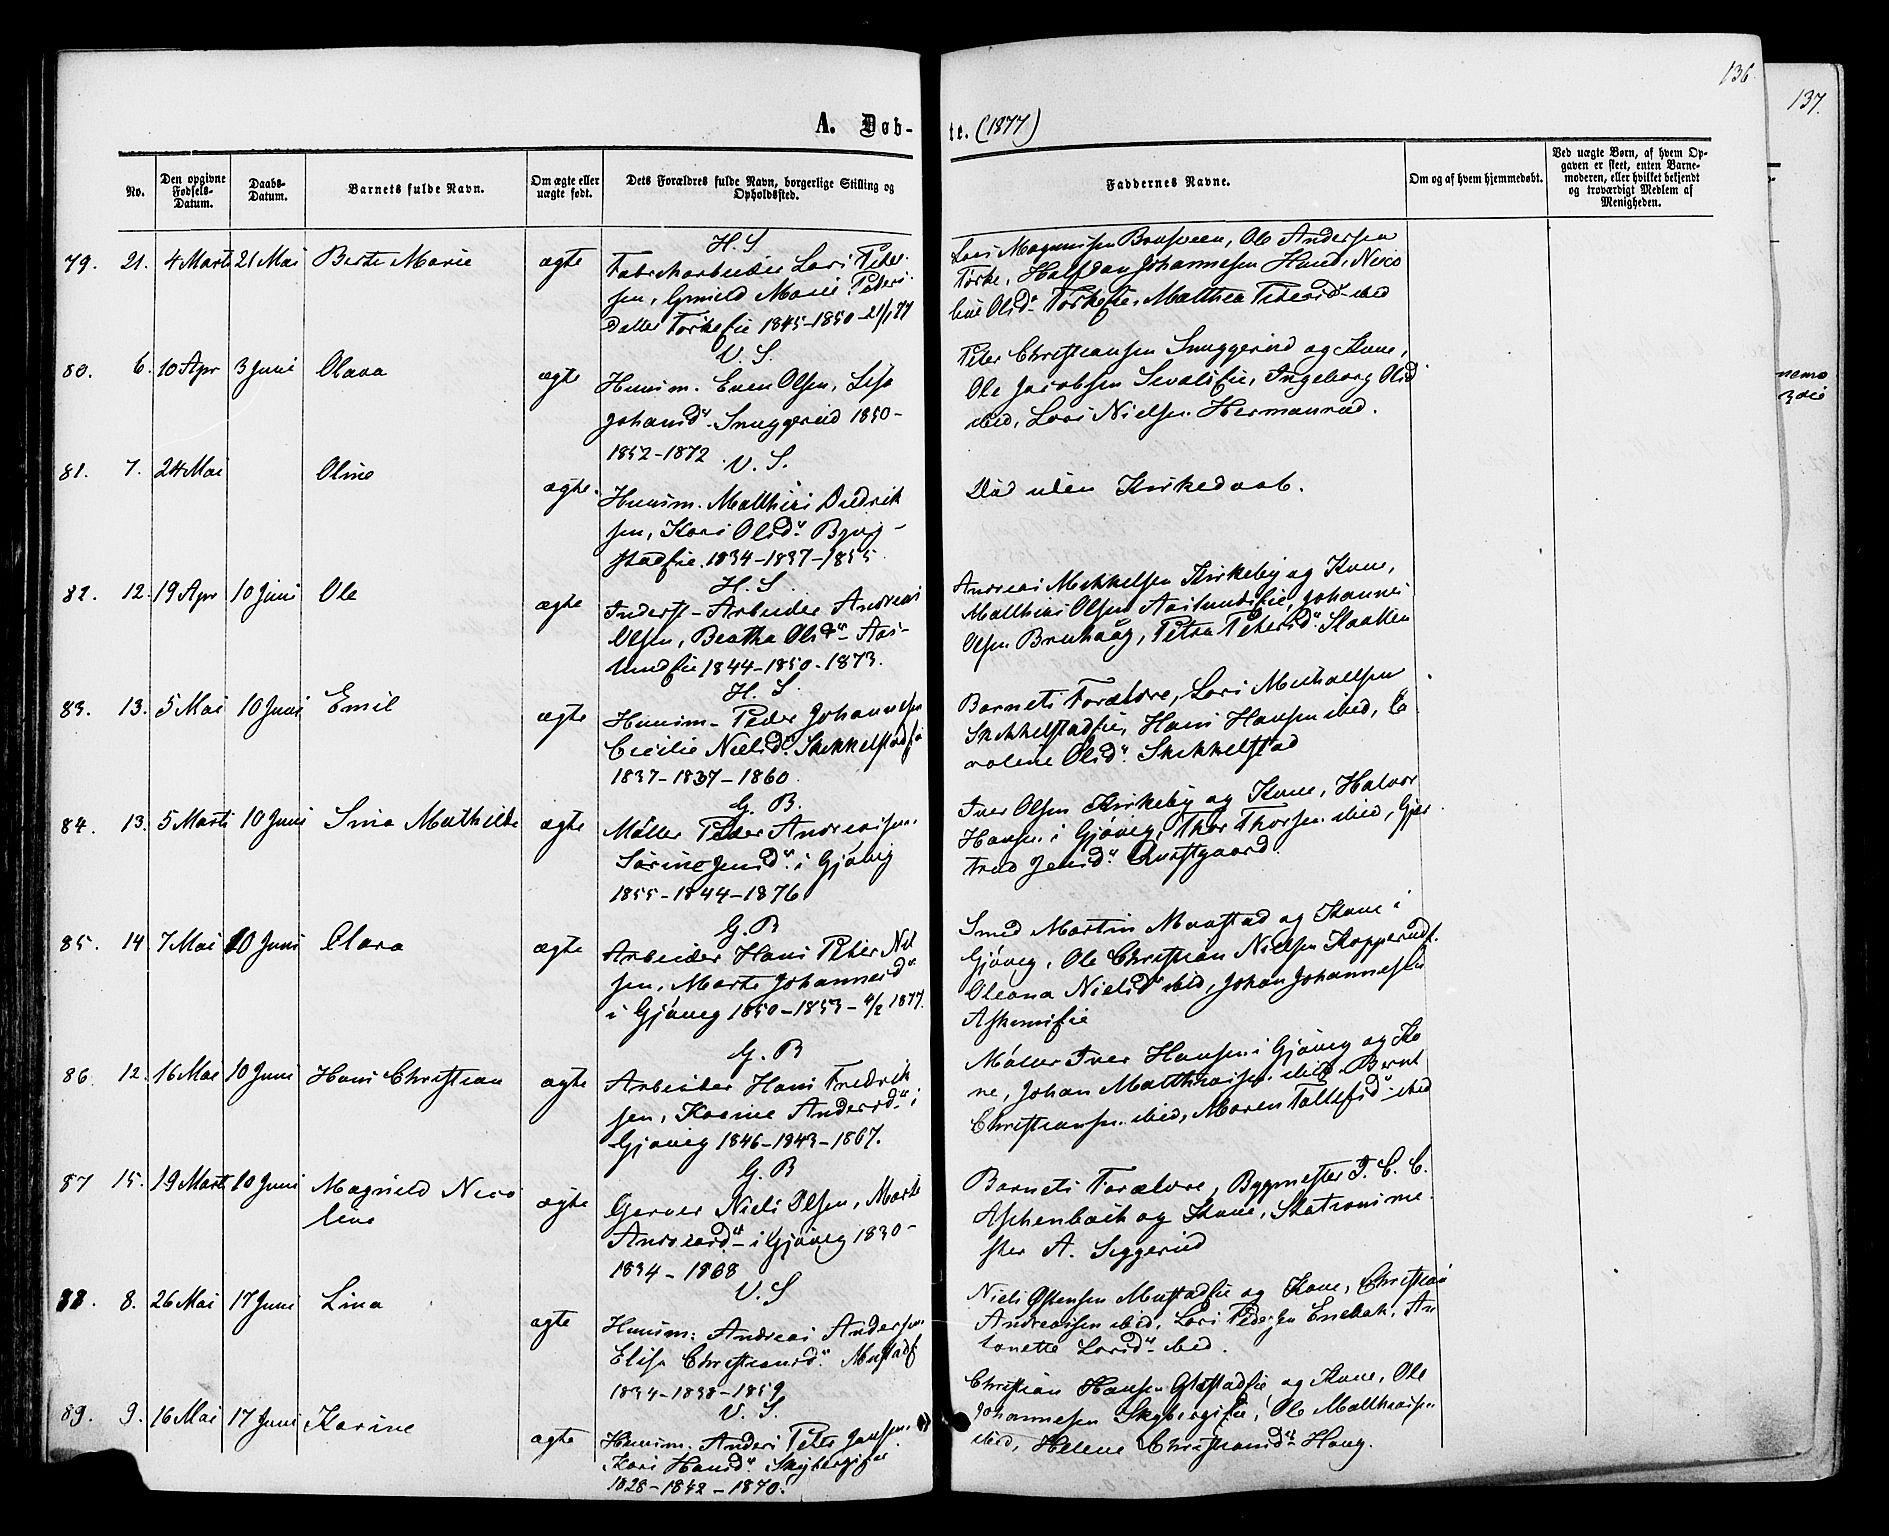 SAH, Vardal prestekontor, H/Ha/Haa/L0007: Ministerialbok nr. 7, 1867-1878, s. 136